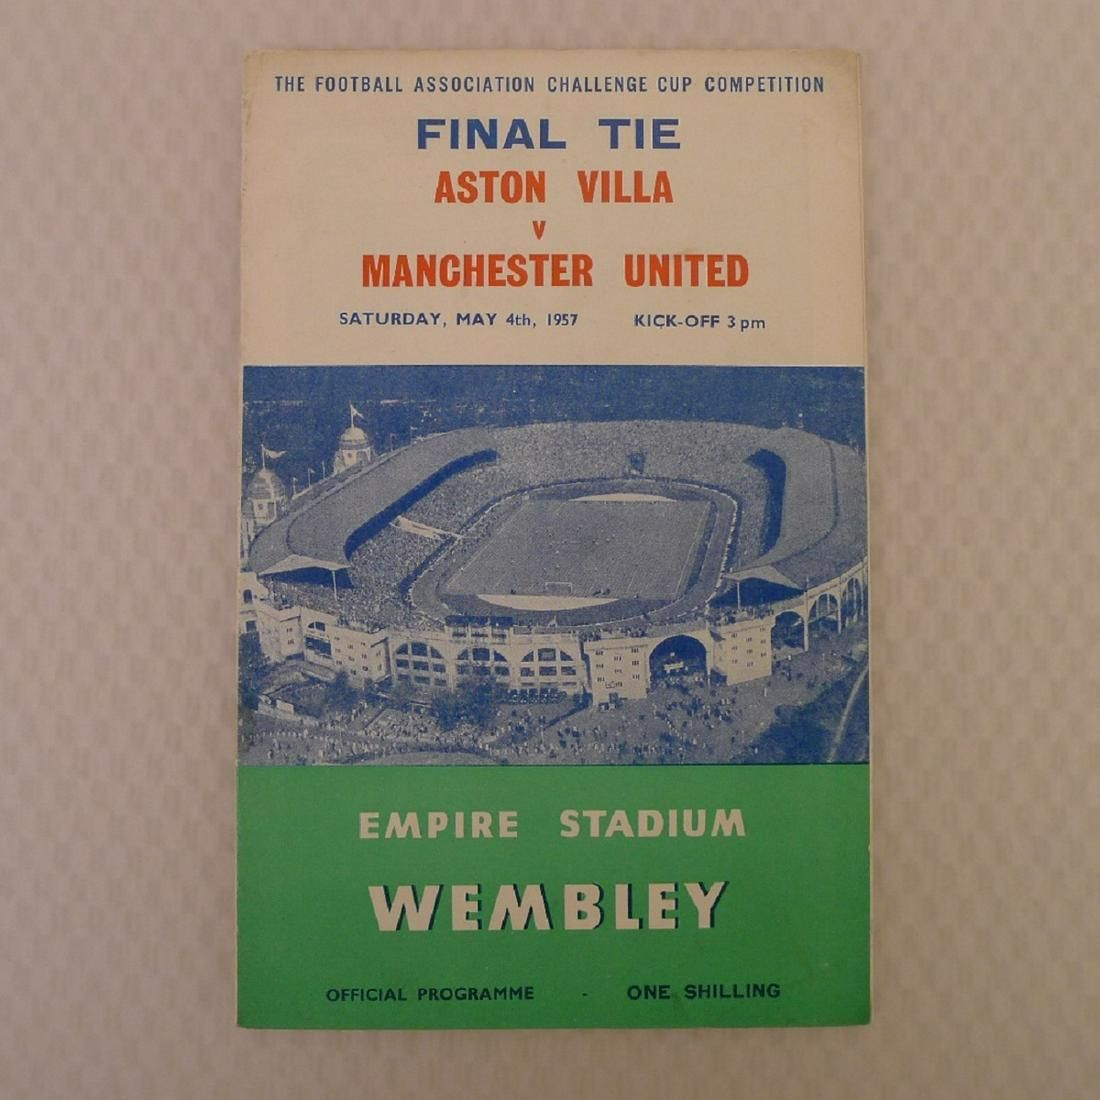 Vintage football programme. FA Cup Final 1957 - Aston